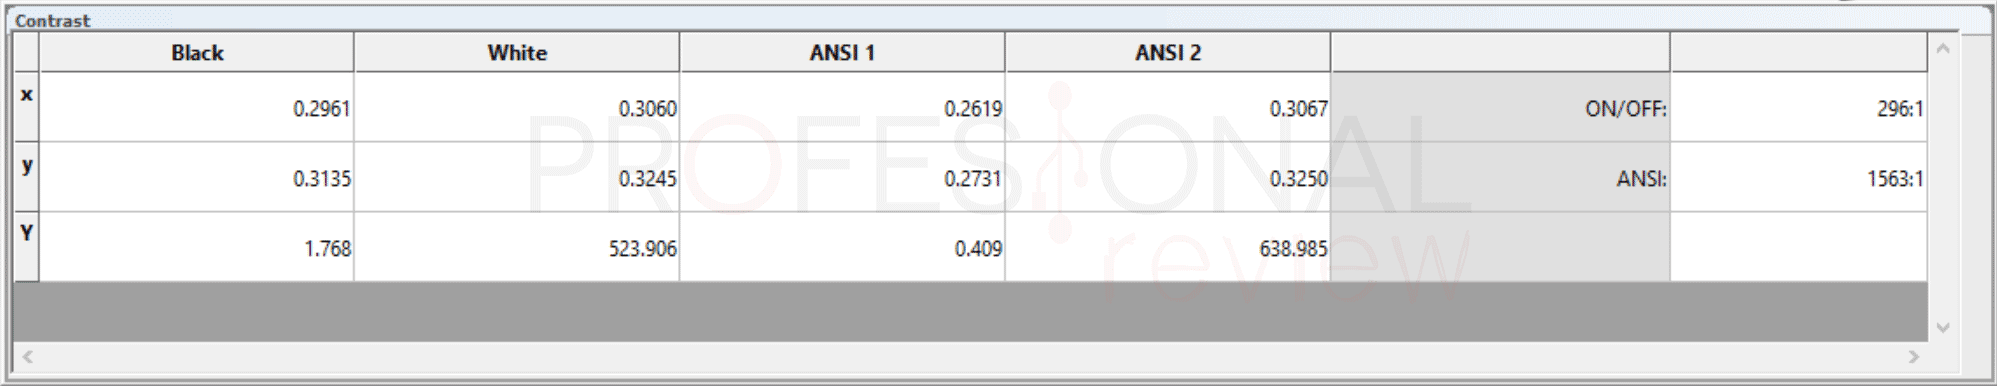 Gigabyte AERO 17 HDR XA Contraste